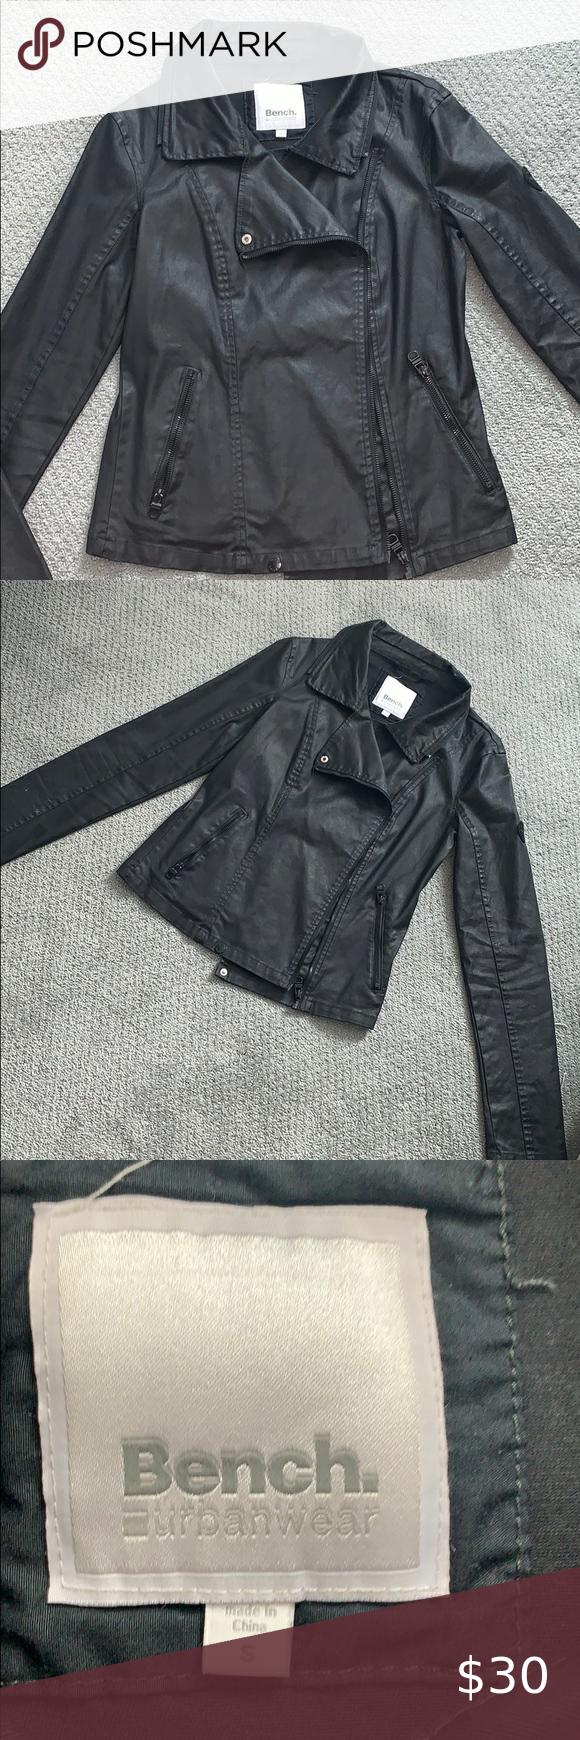 Bench Urbanwear Jacket Bench Jackets Urban Wear Jackets [ 1740 x 580 Pixel ]